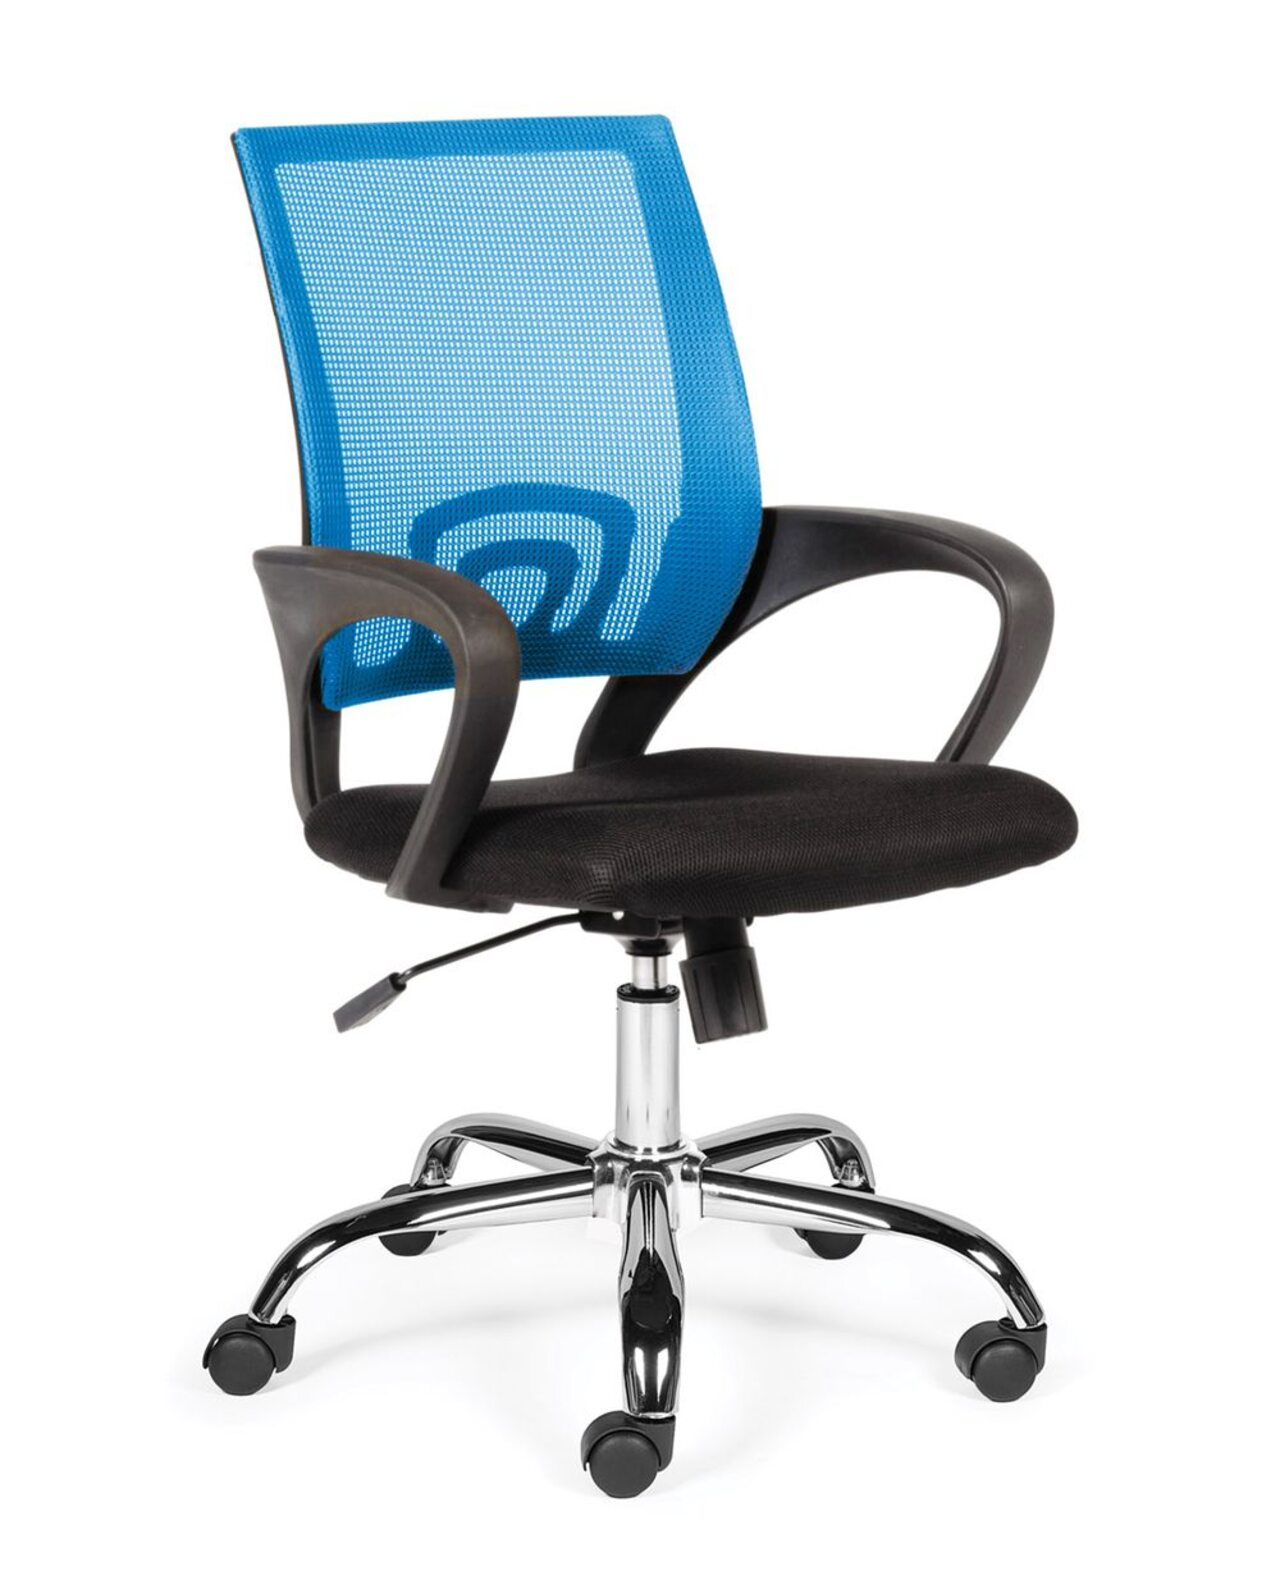 Кресло офисное Спринг 804-1 chrome  - фото 5